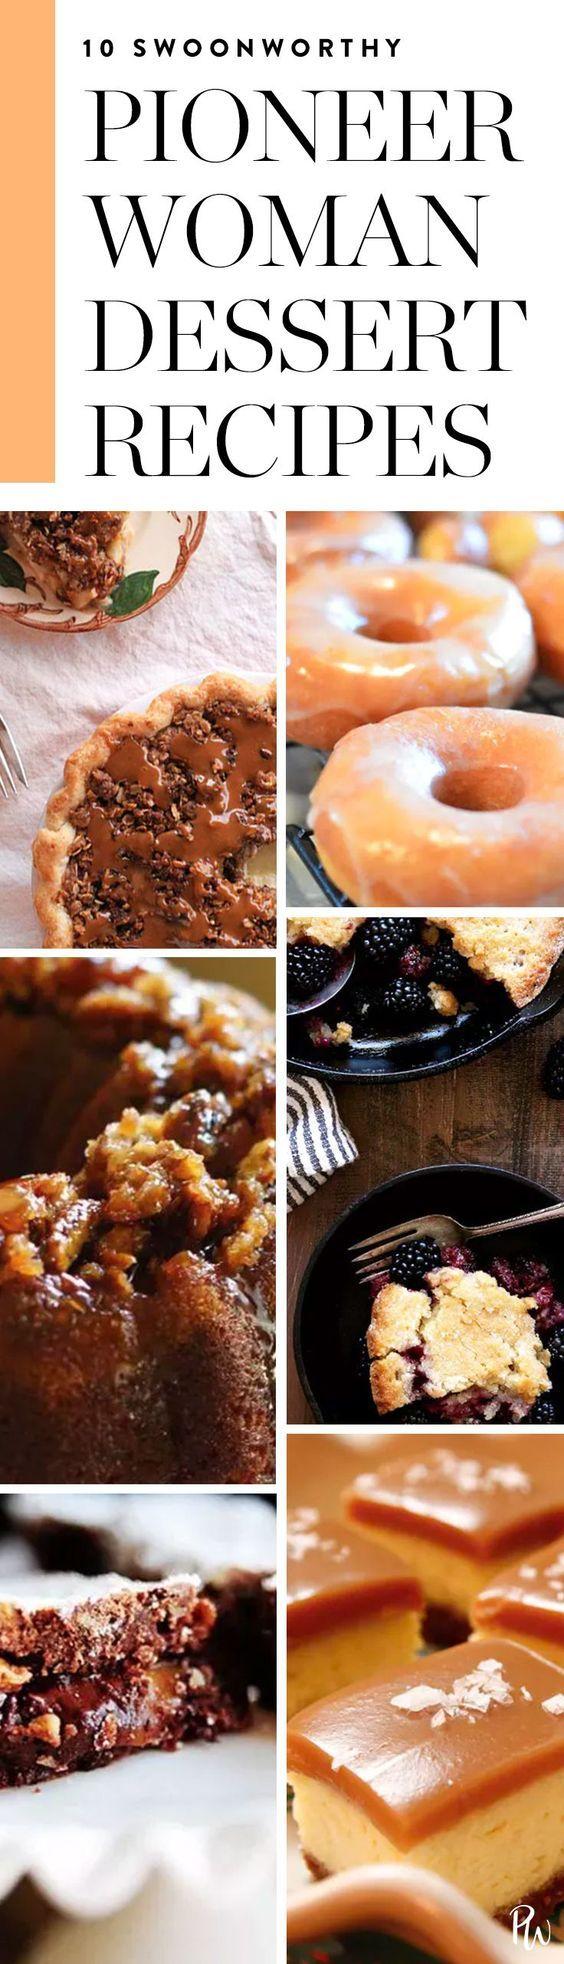 Watch Winecream— mynew favorite dessert for Friday evenings video